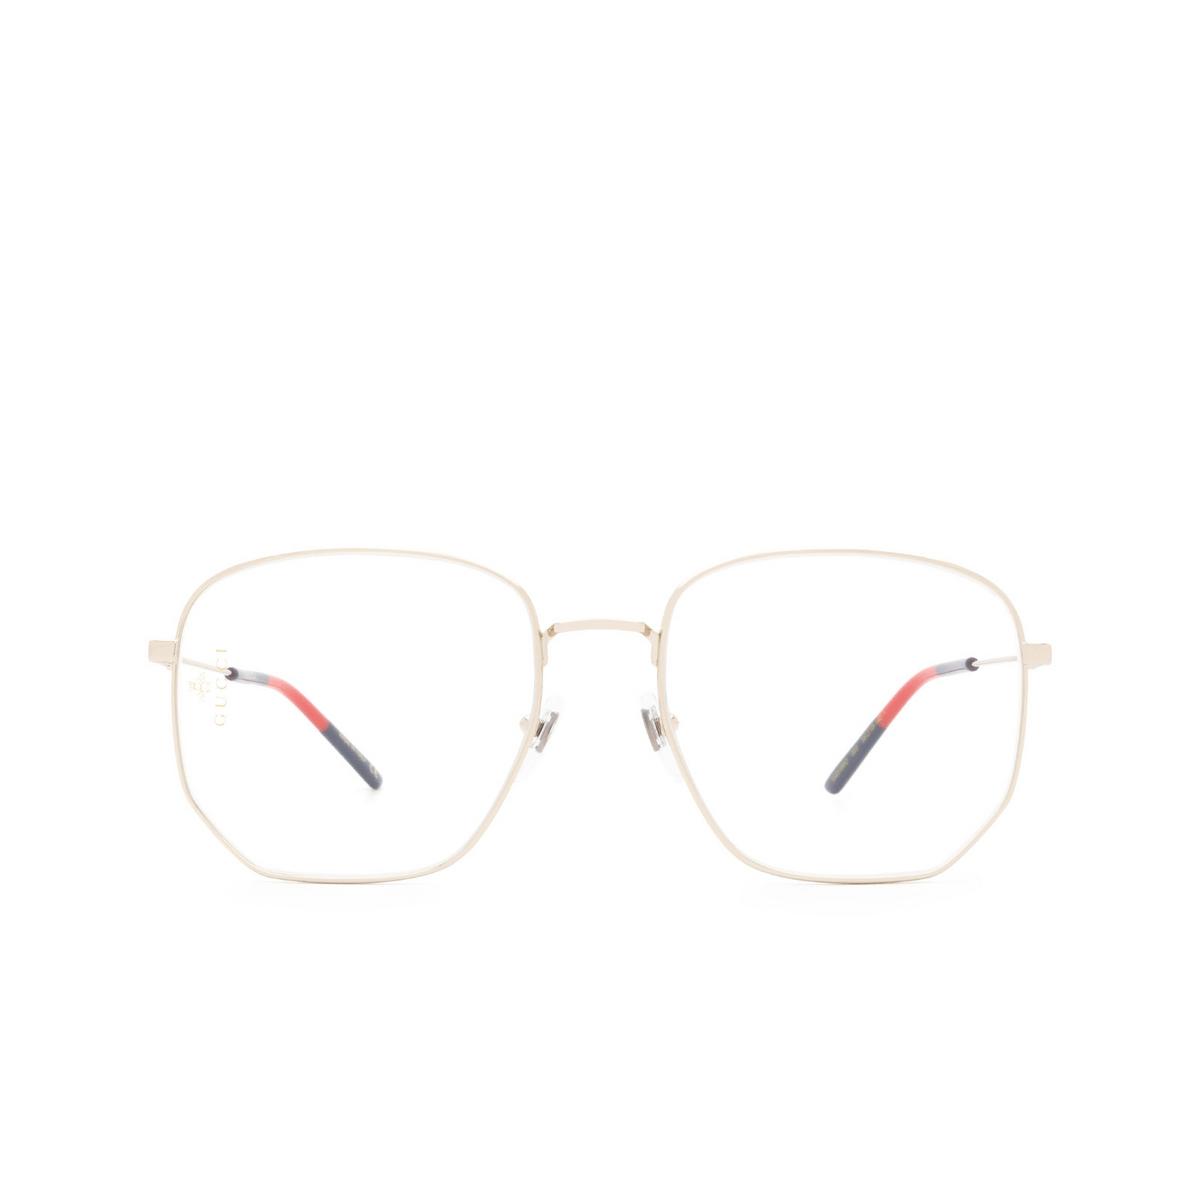 Gucci® Square Eyeglasses: GG0396O color Light Gold 003.